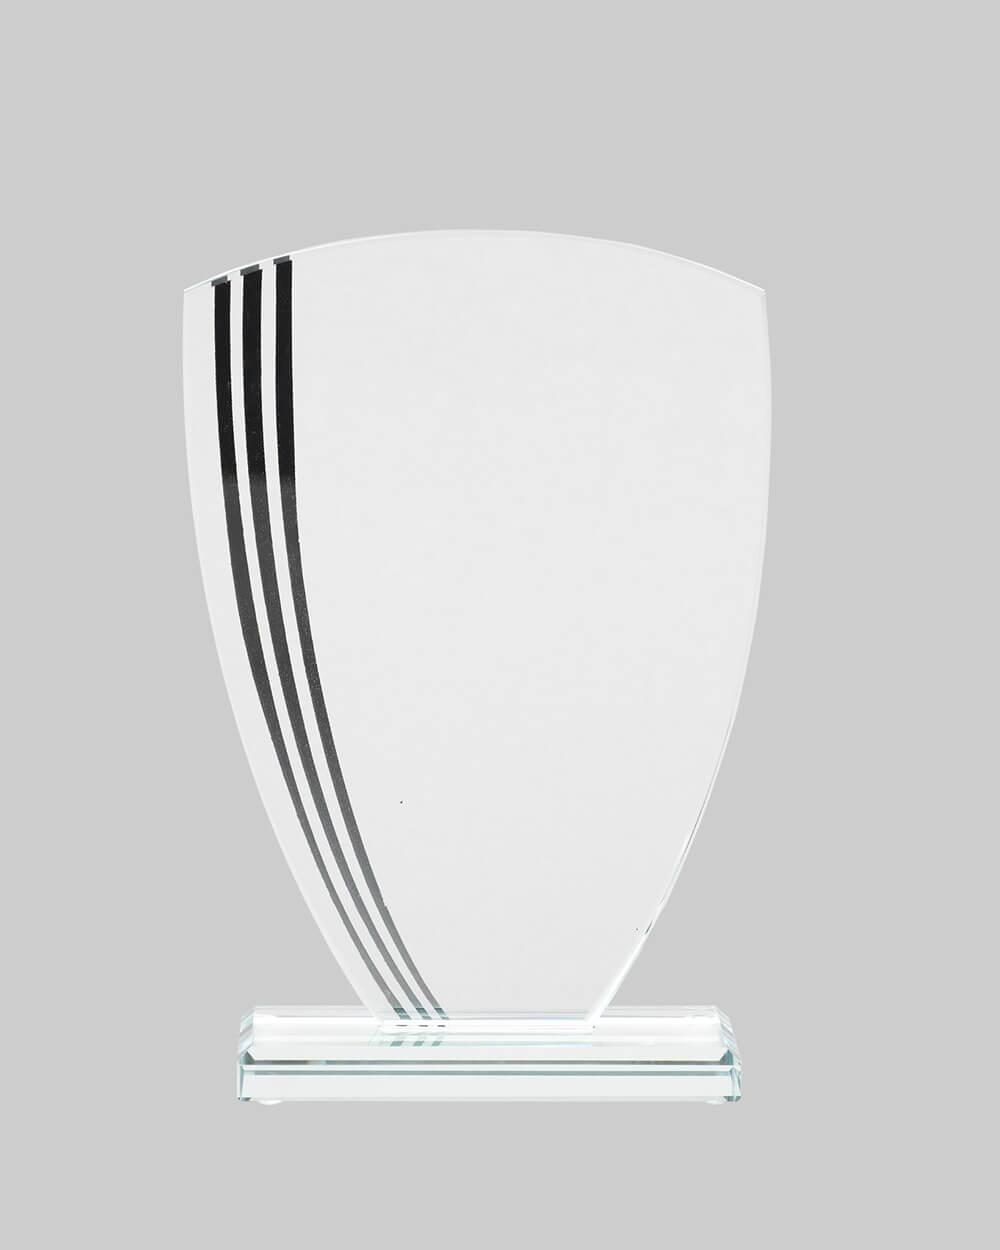 Glass w/ Lines Shield Award in Black